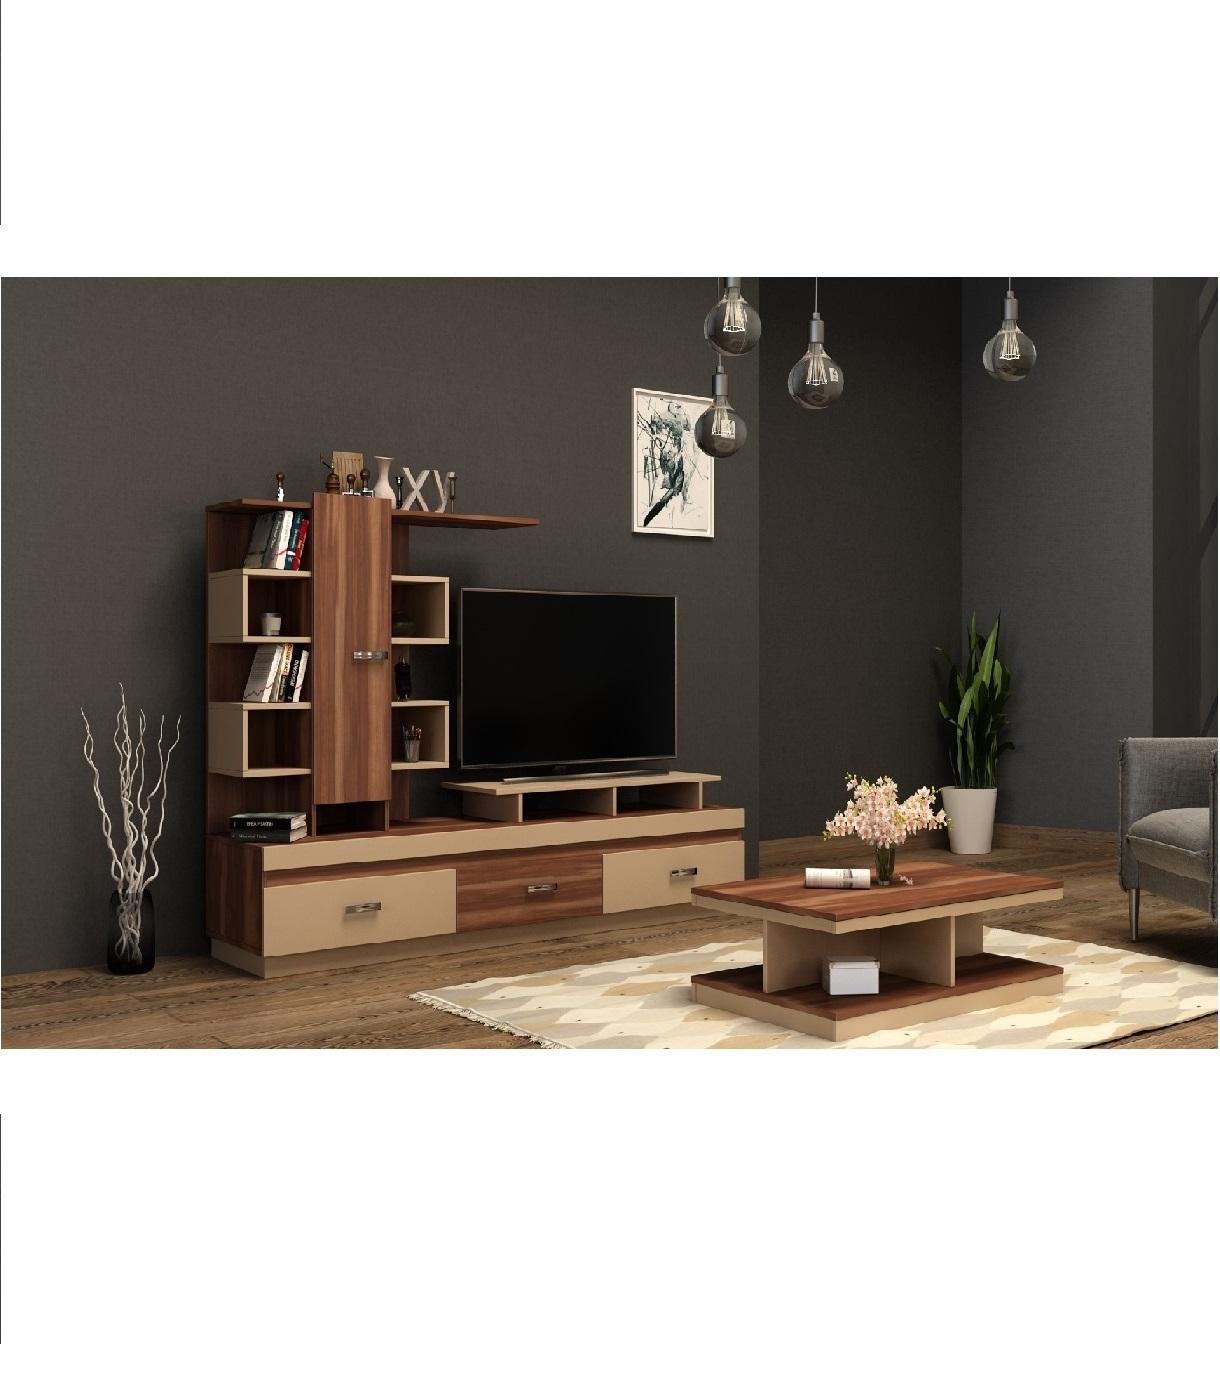 coccinelle meuble tv table basse diva